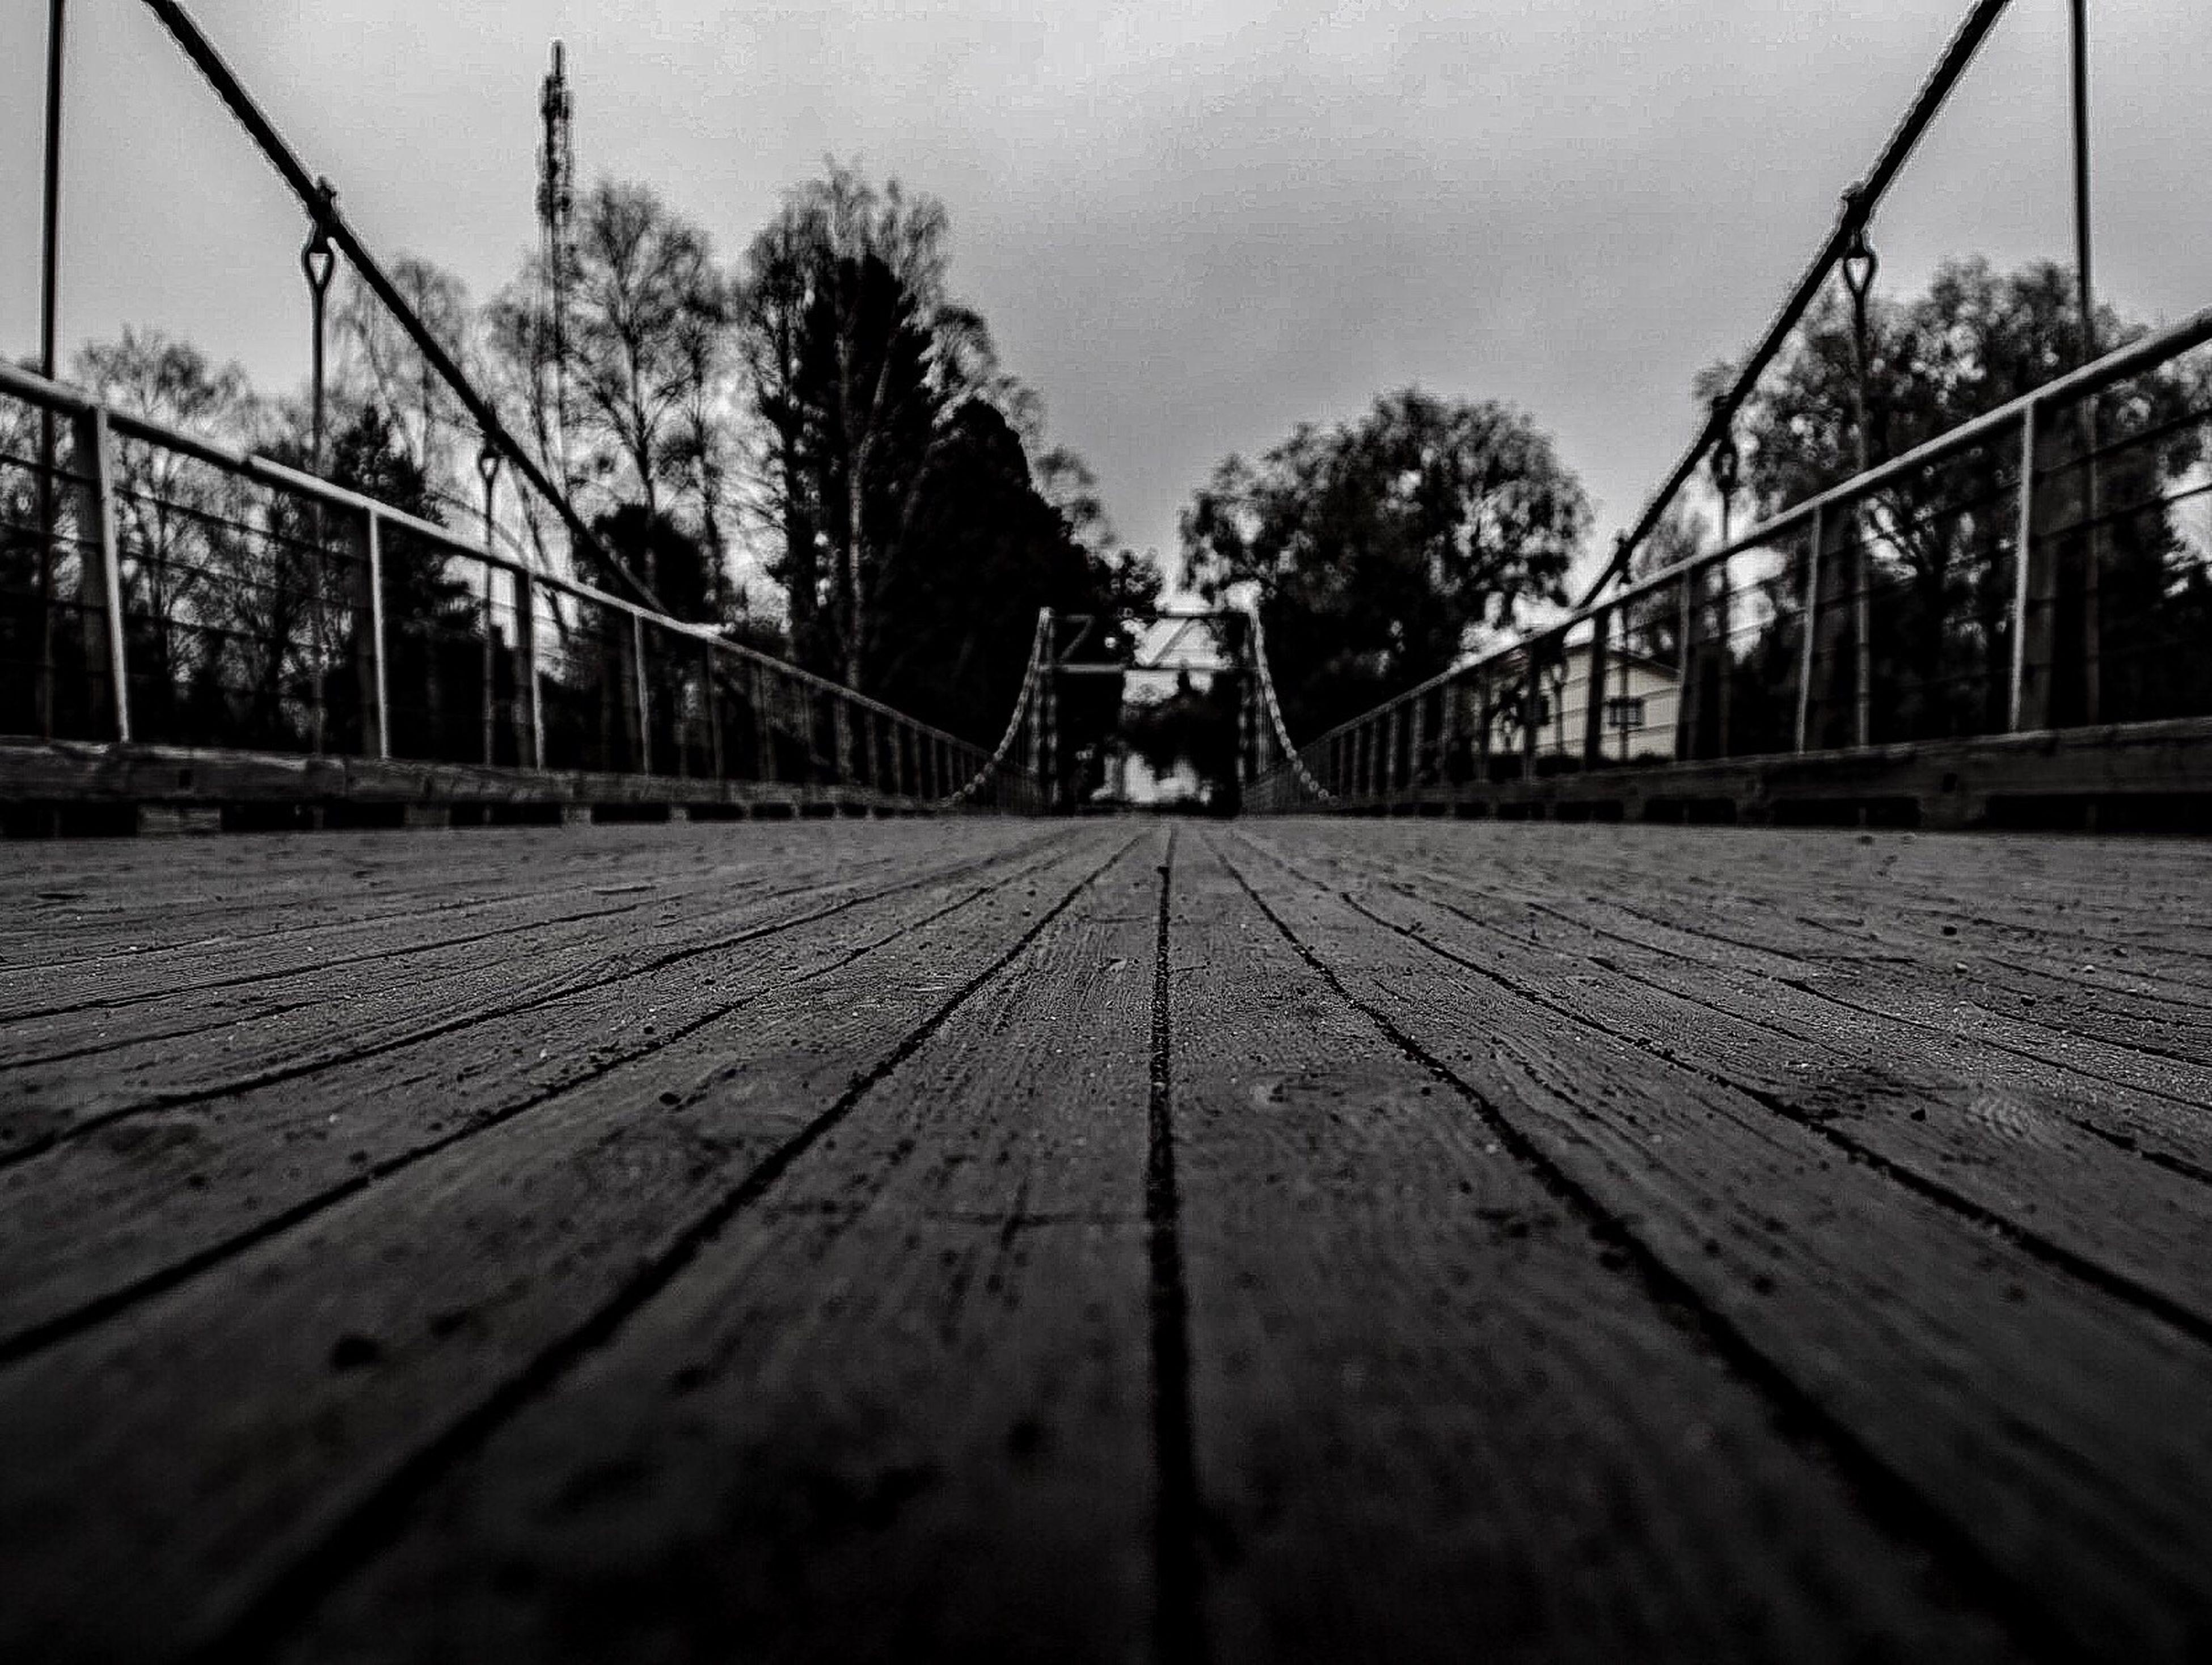 Photographer Canoneos Photography Ilmajoki Finland Canonphotography Autumn 2016 Bridge Bridgephotography Followme